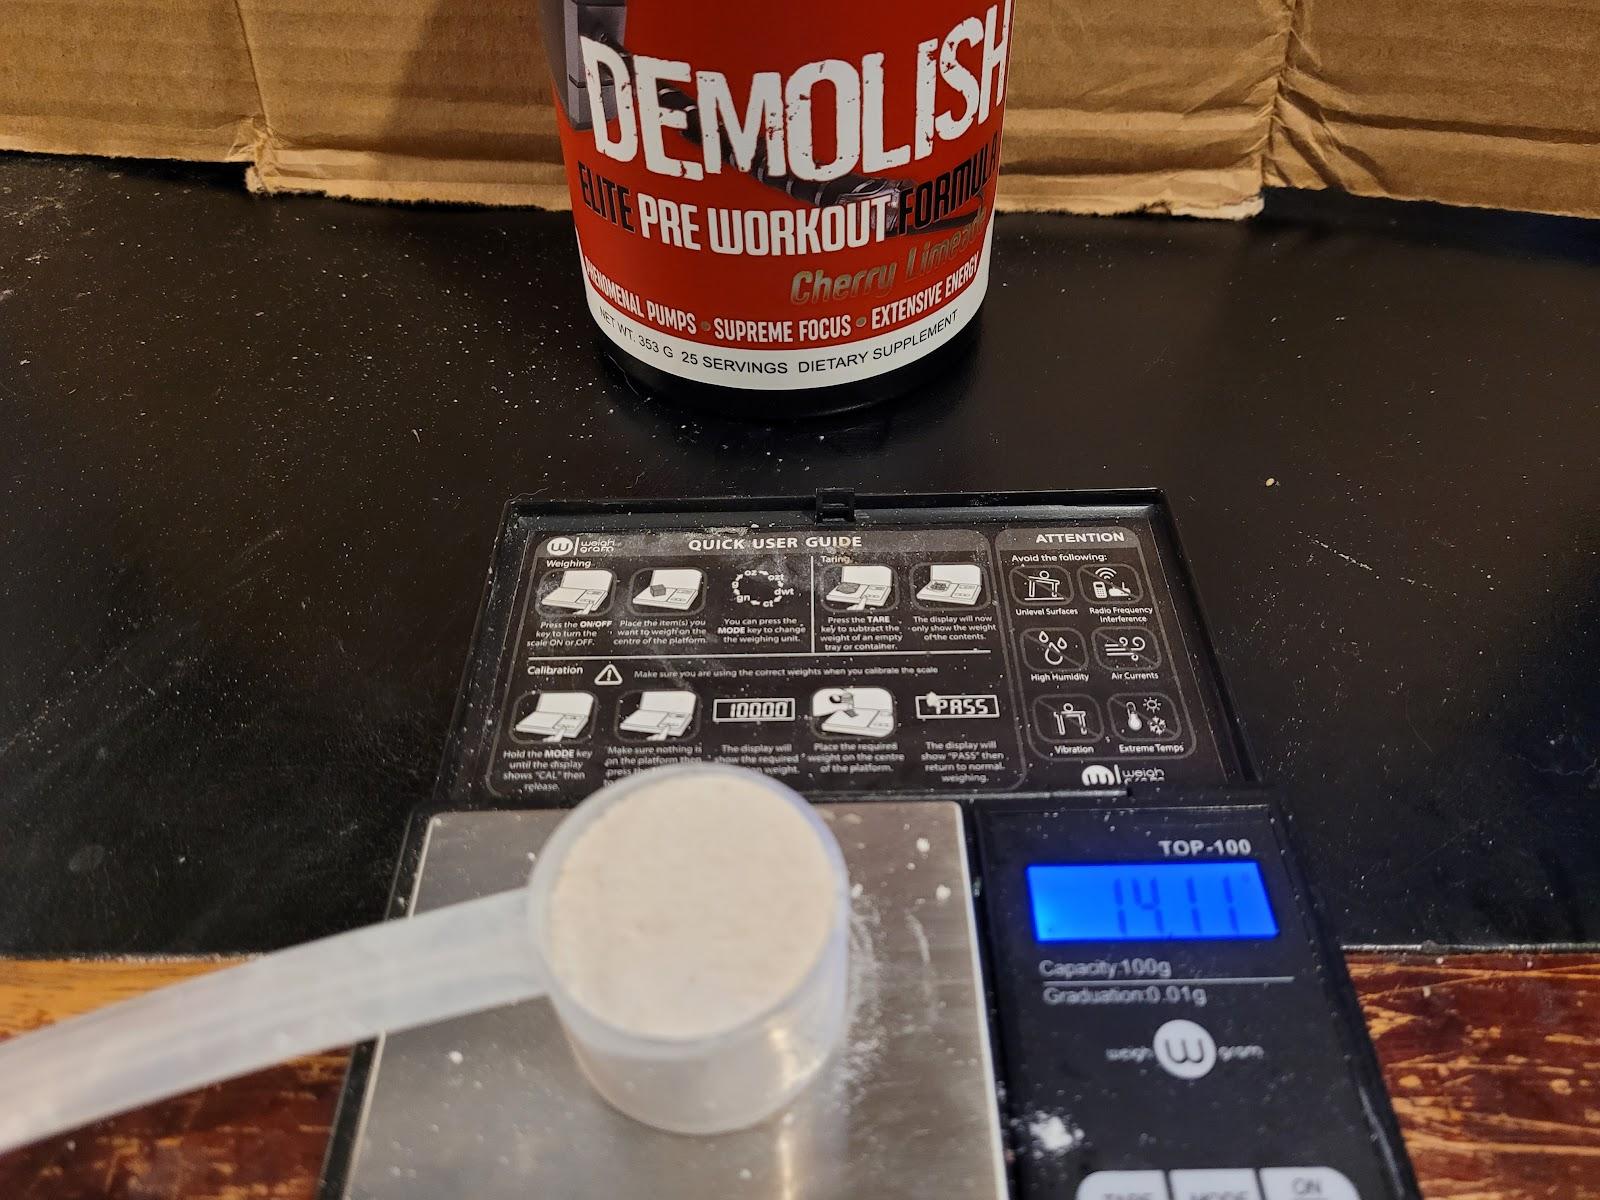 Demolish Pre Workout Scoop Size